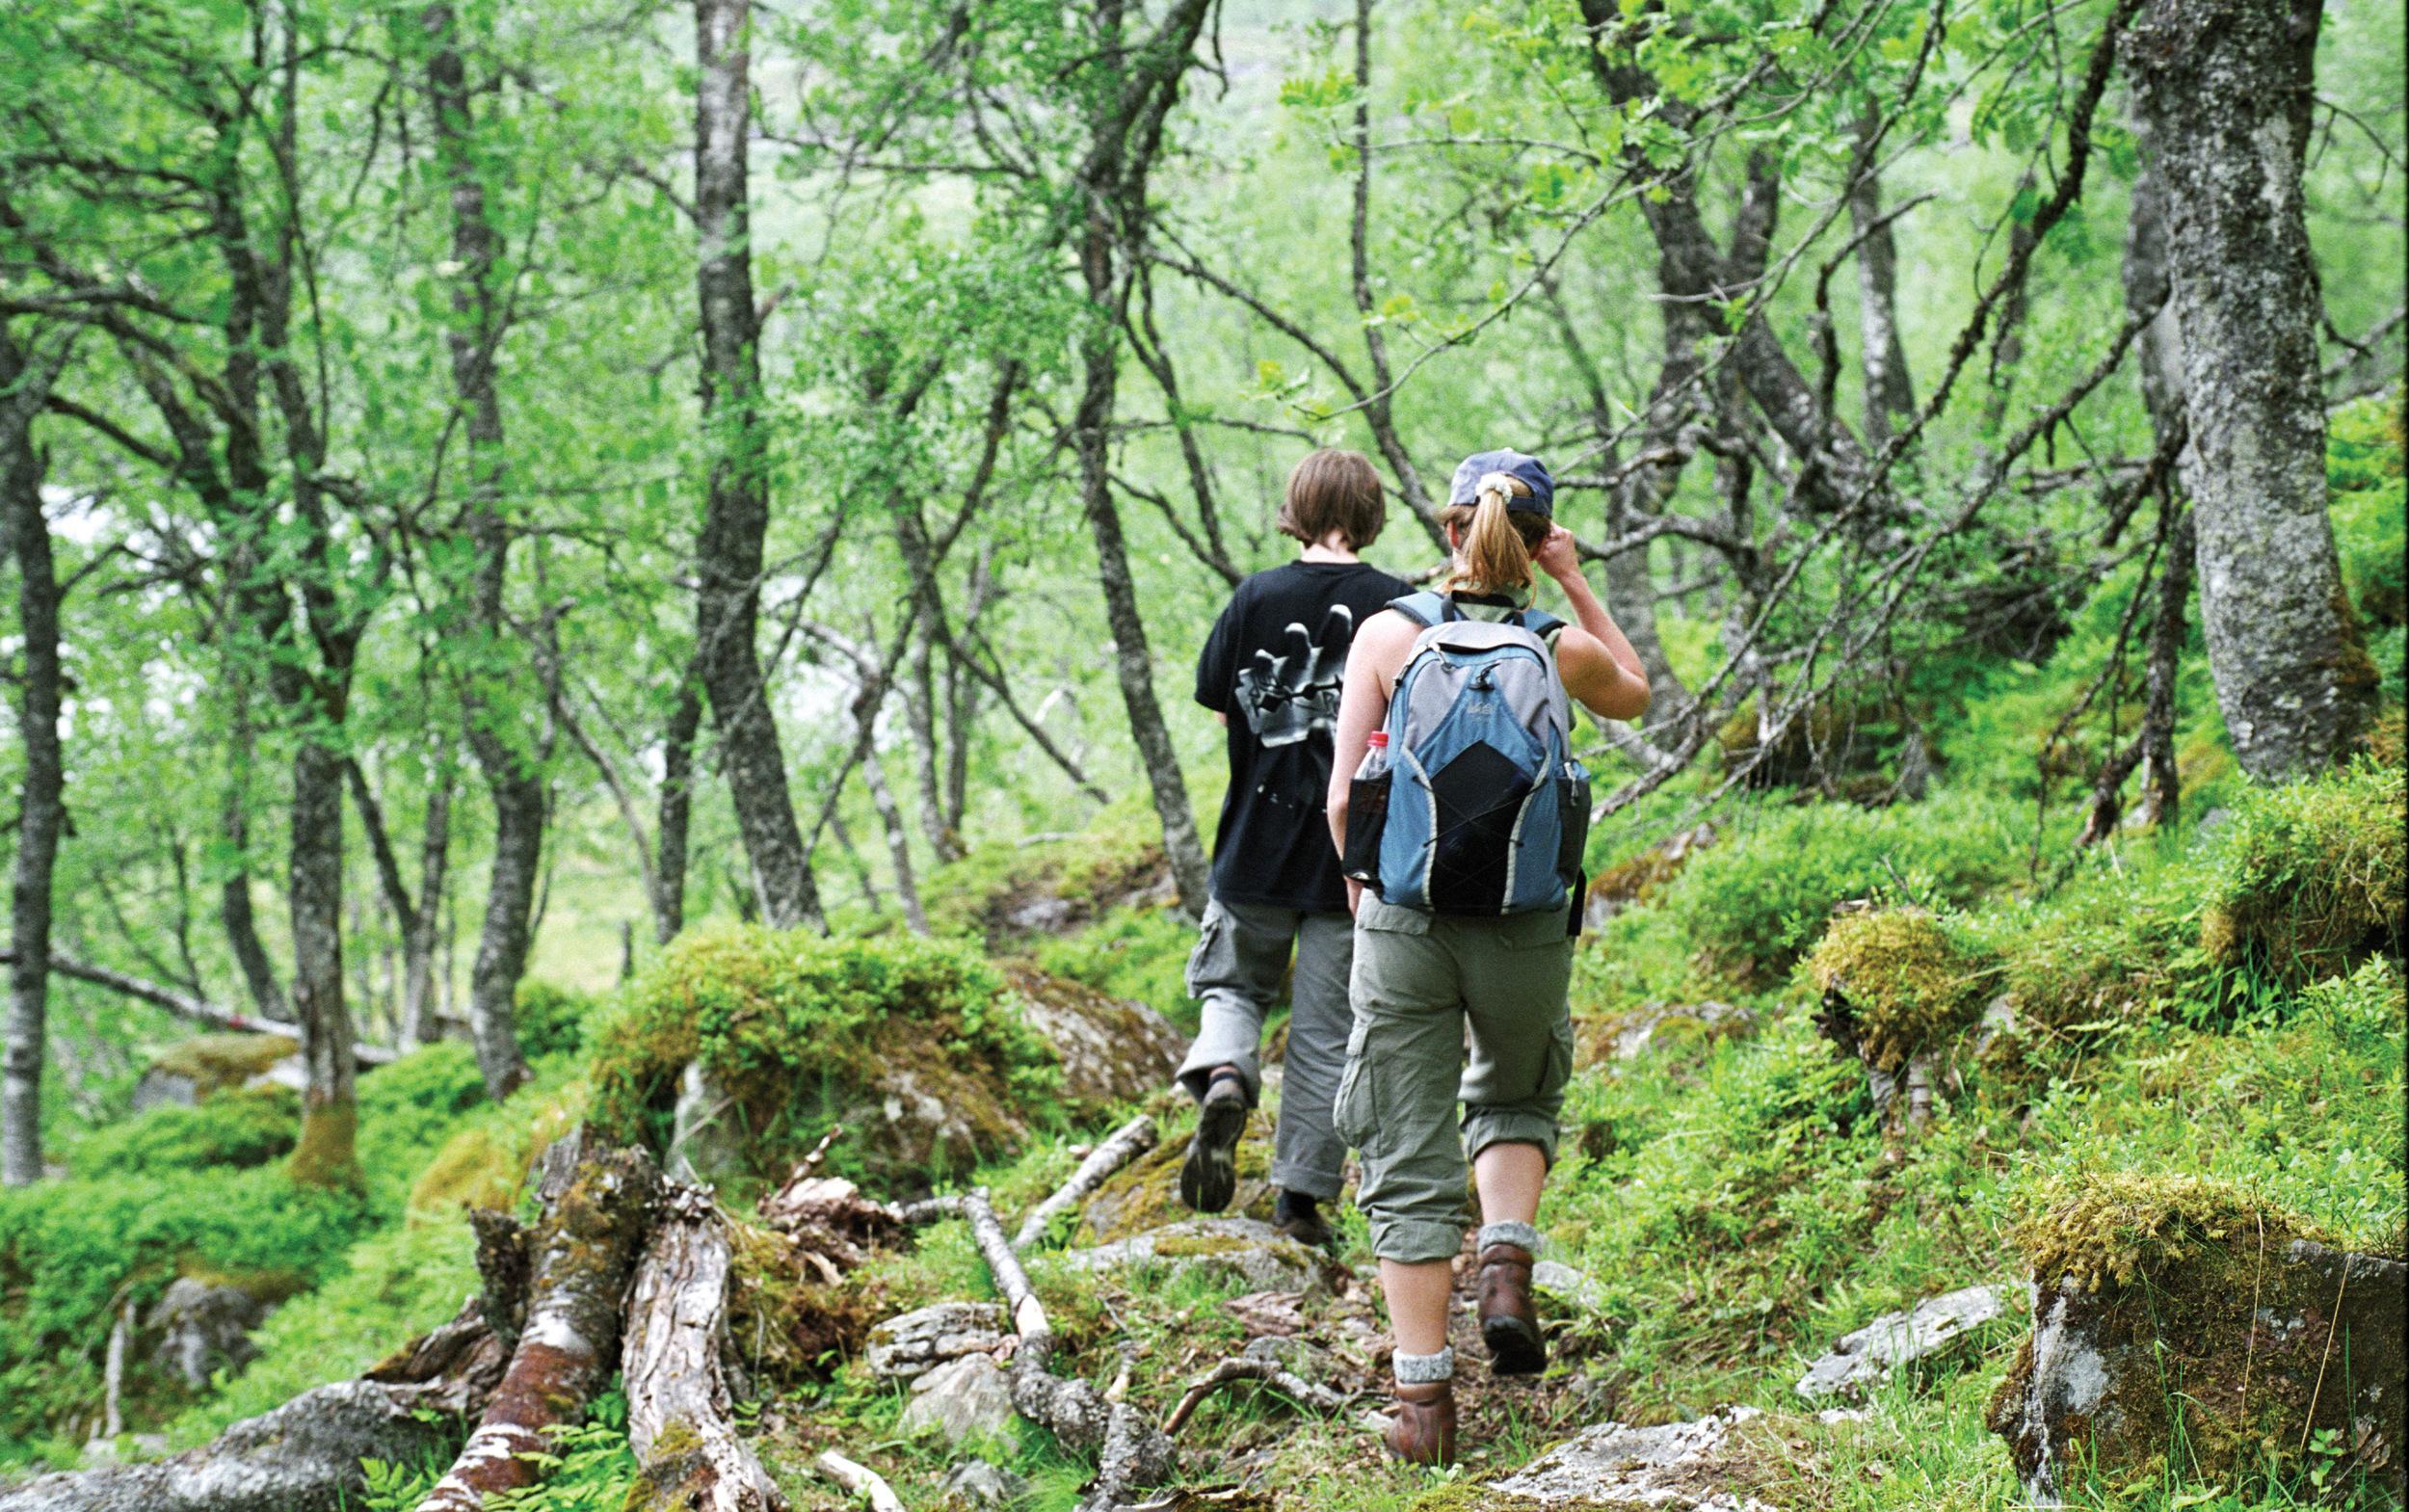 Fotturer er den vanligste aktiviteten knytta til skog. Naustdal, Sogn og Fjordane. Foto: Lars Sandved Dalen, NIBIO